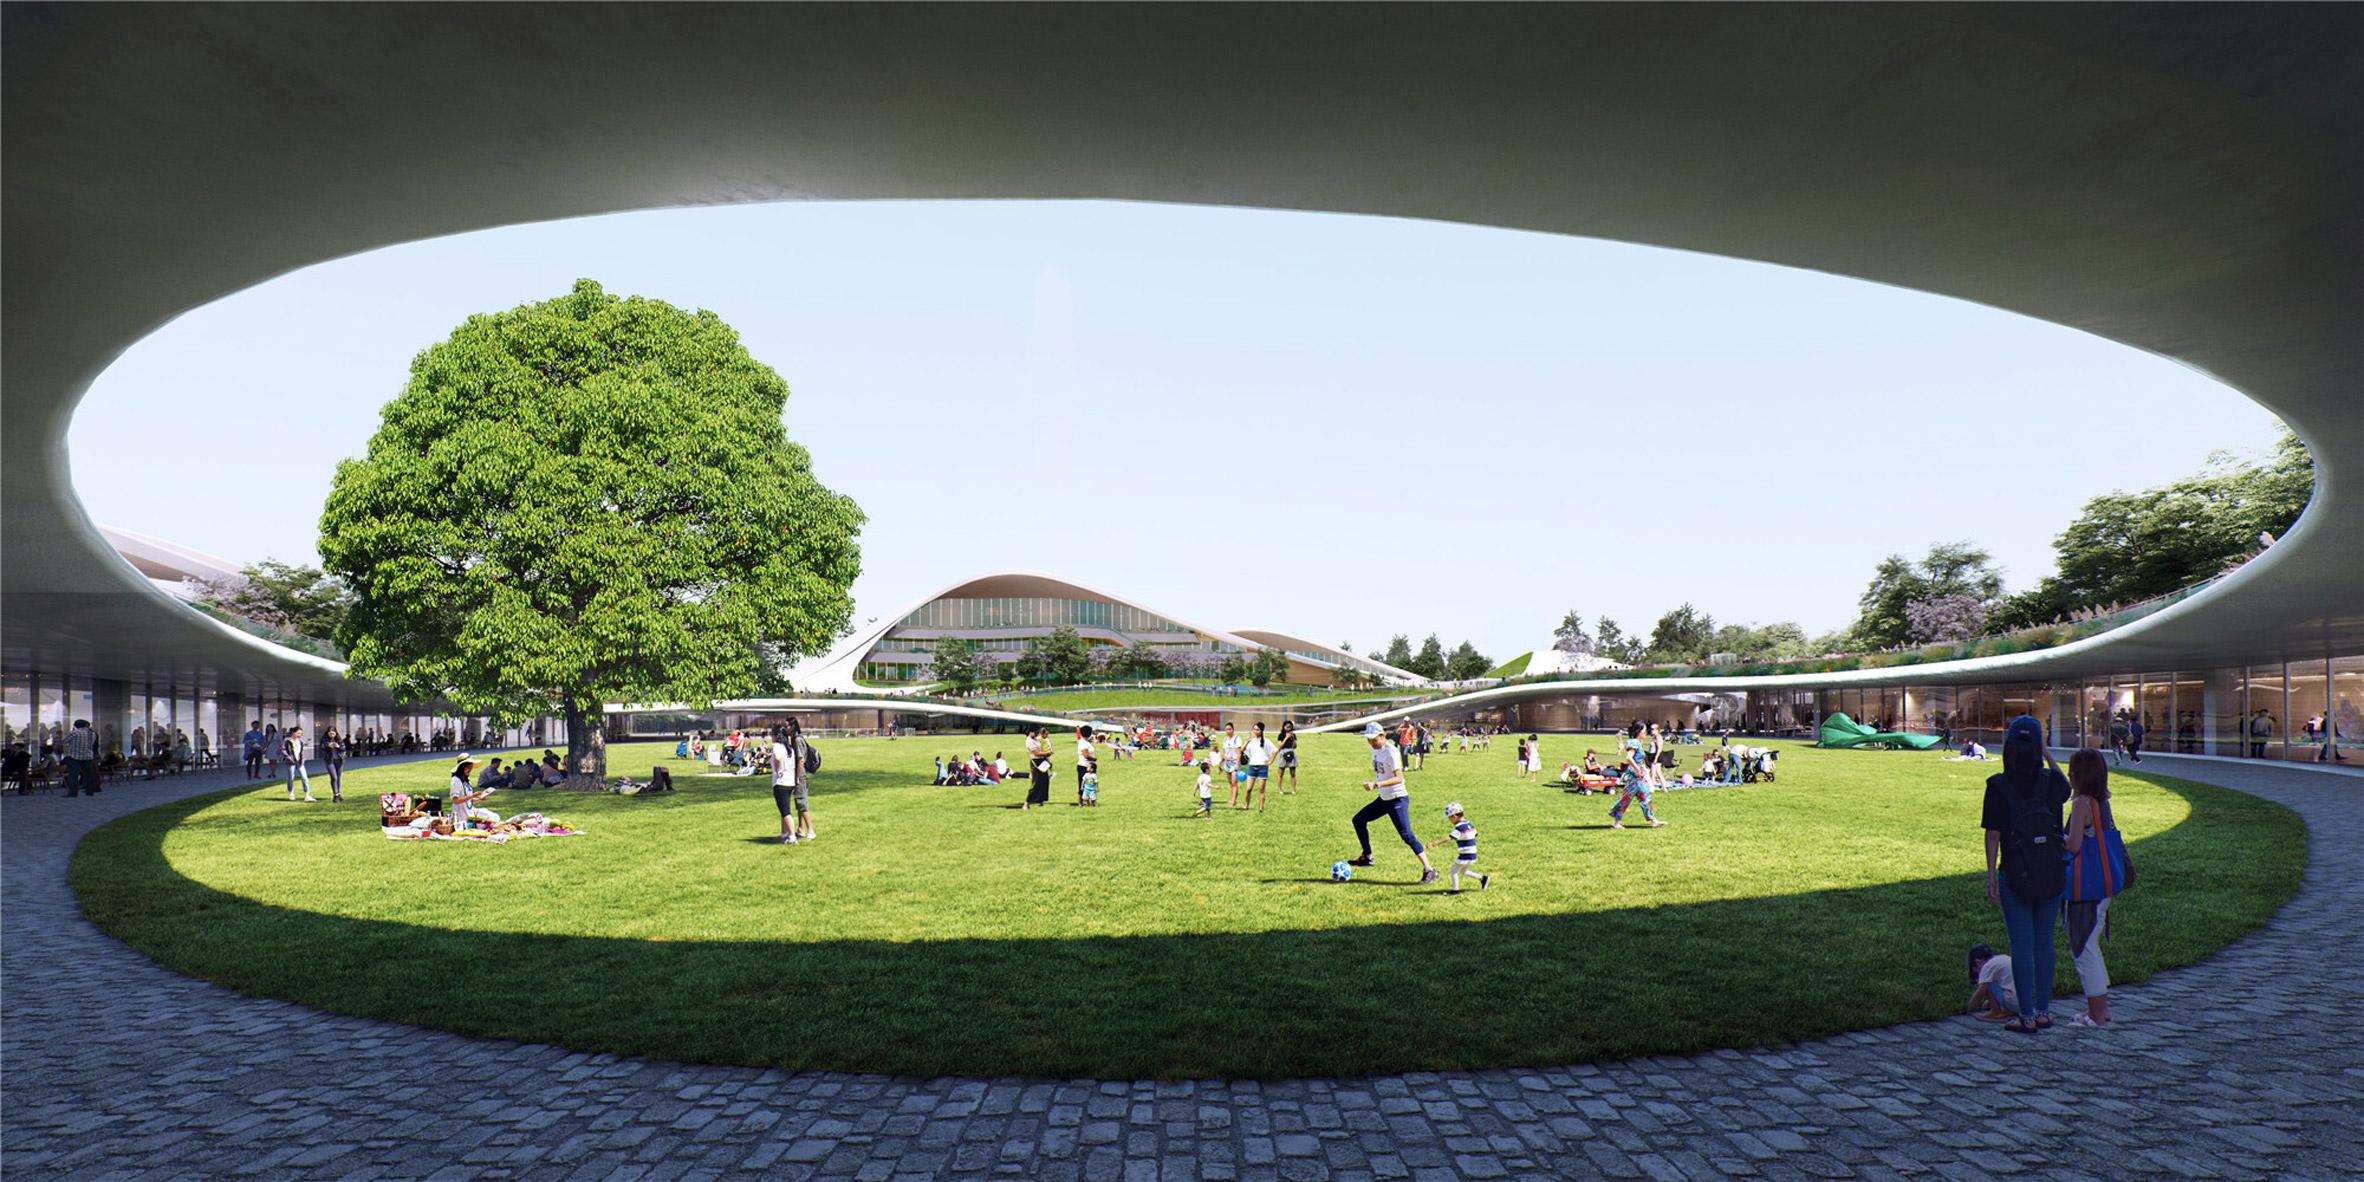 MAD designed the lawn as a public park